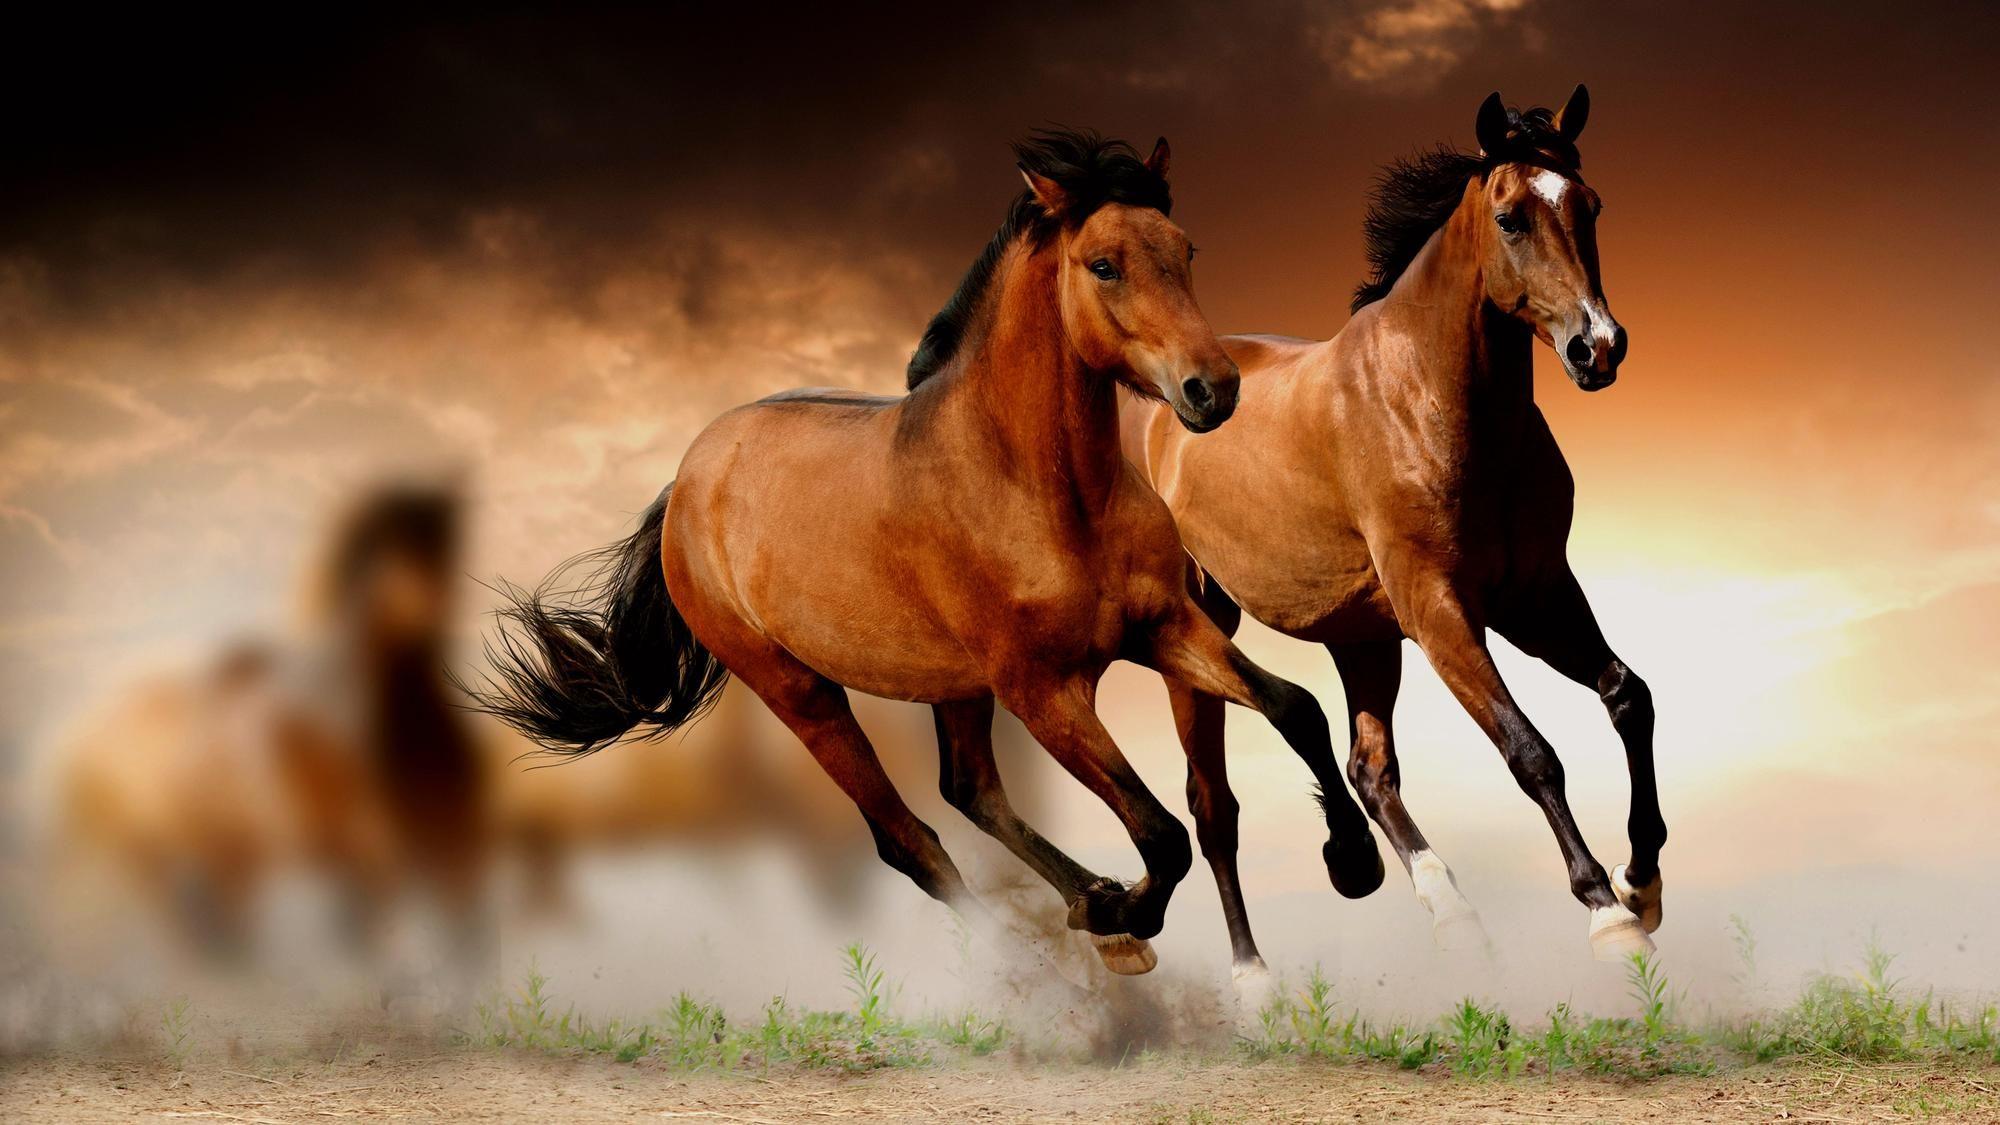 Freenom World Horse Wallpaper Horses Beautiful Horses